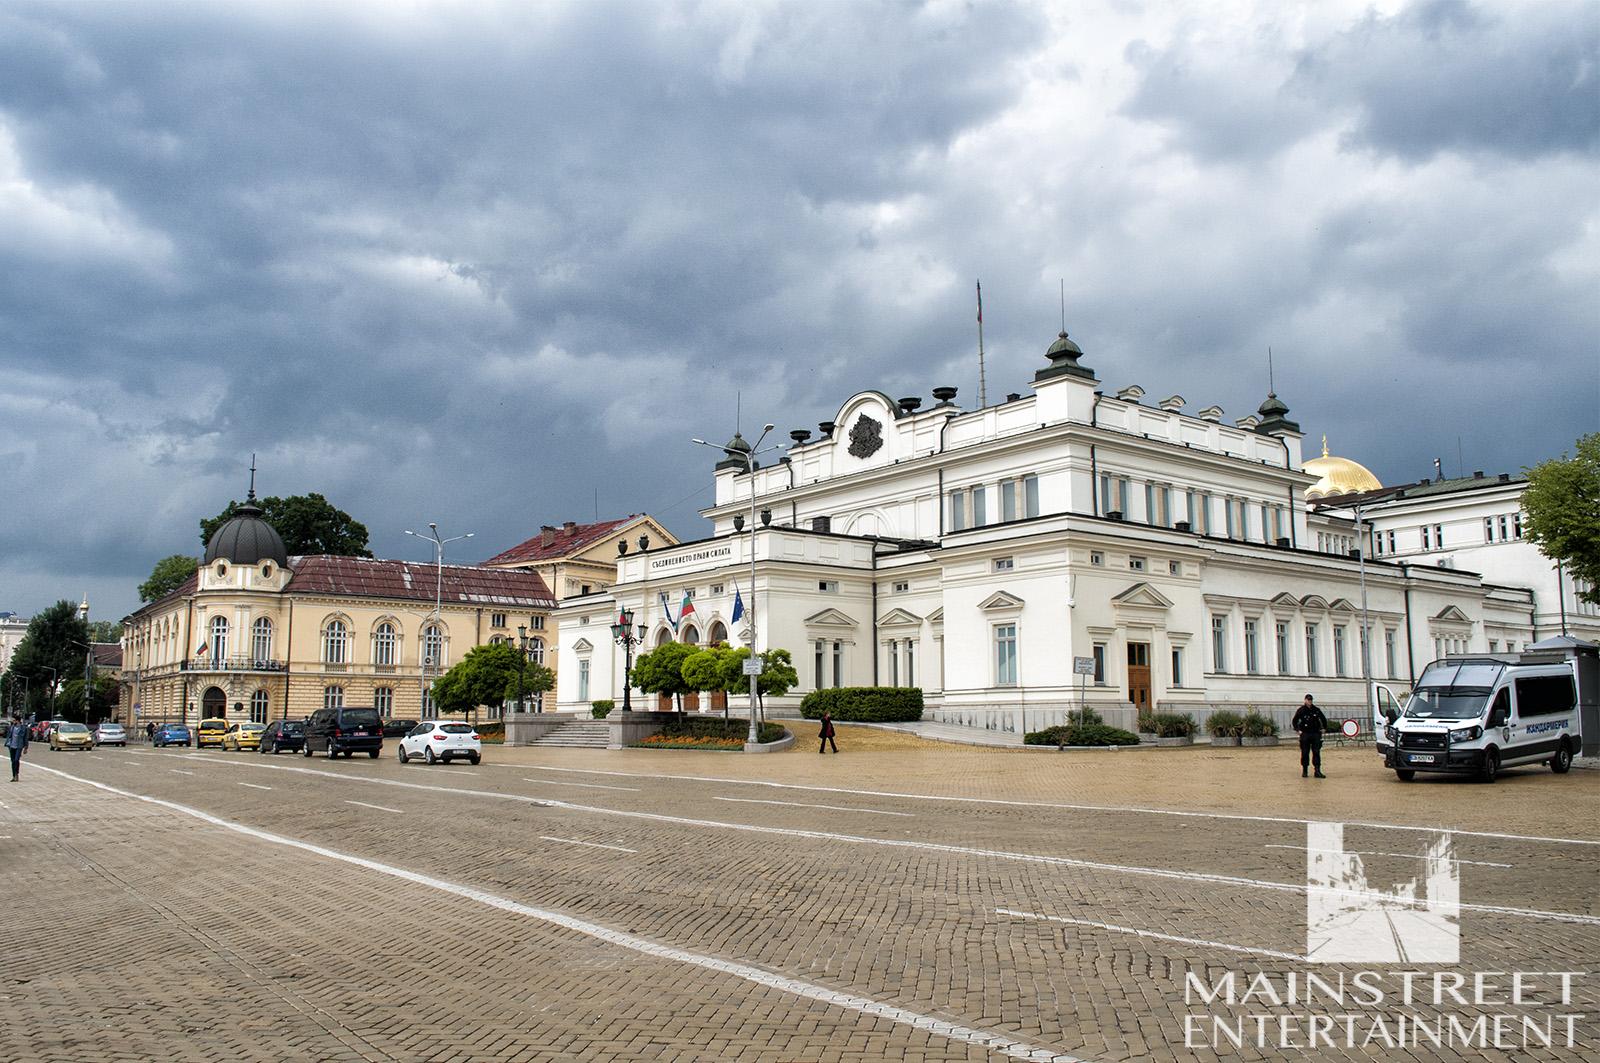 palais parliament film location period